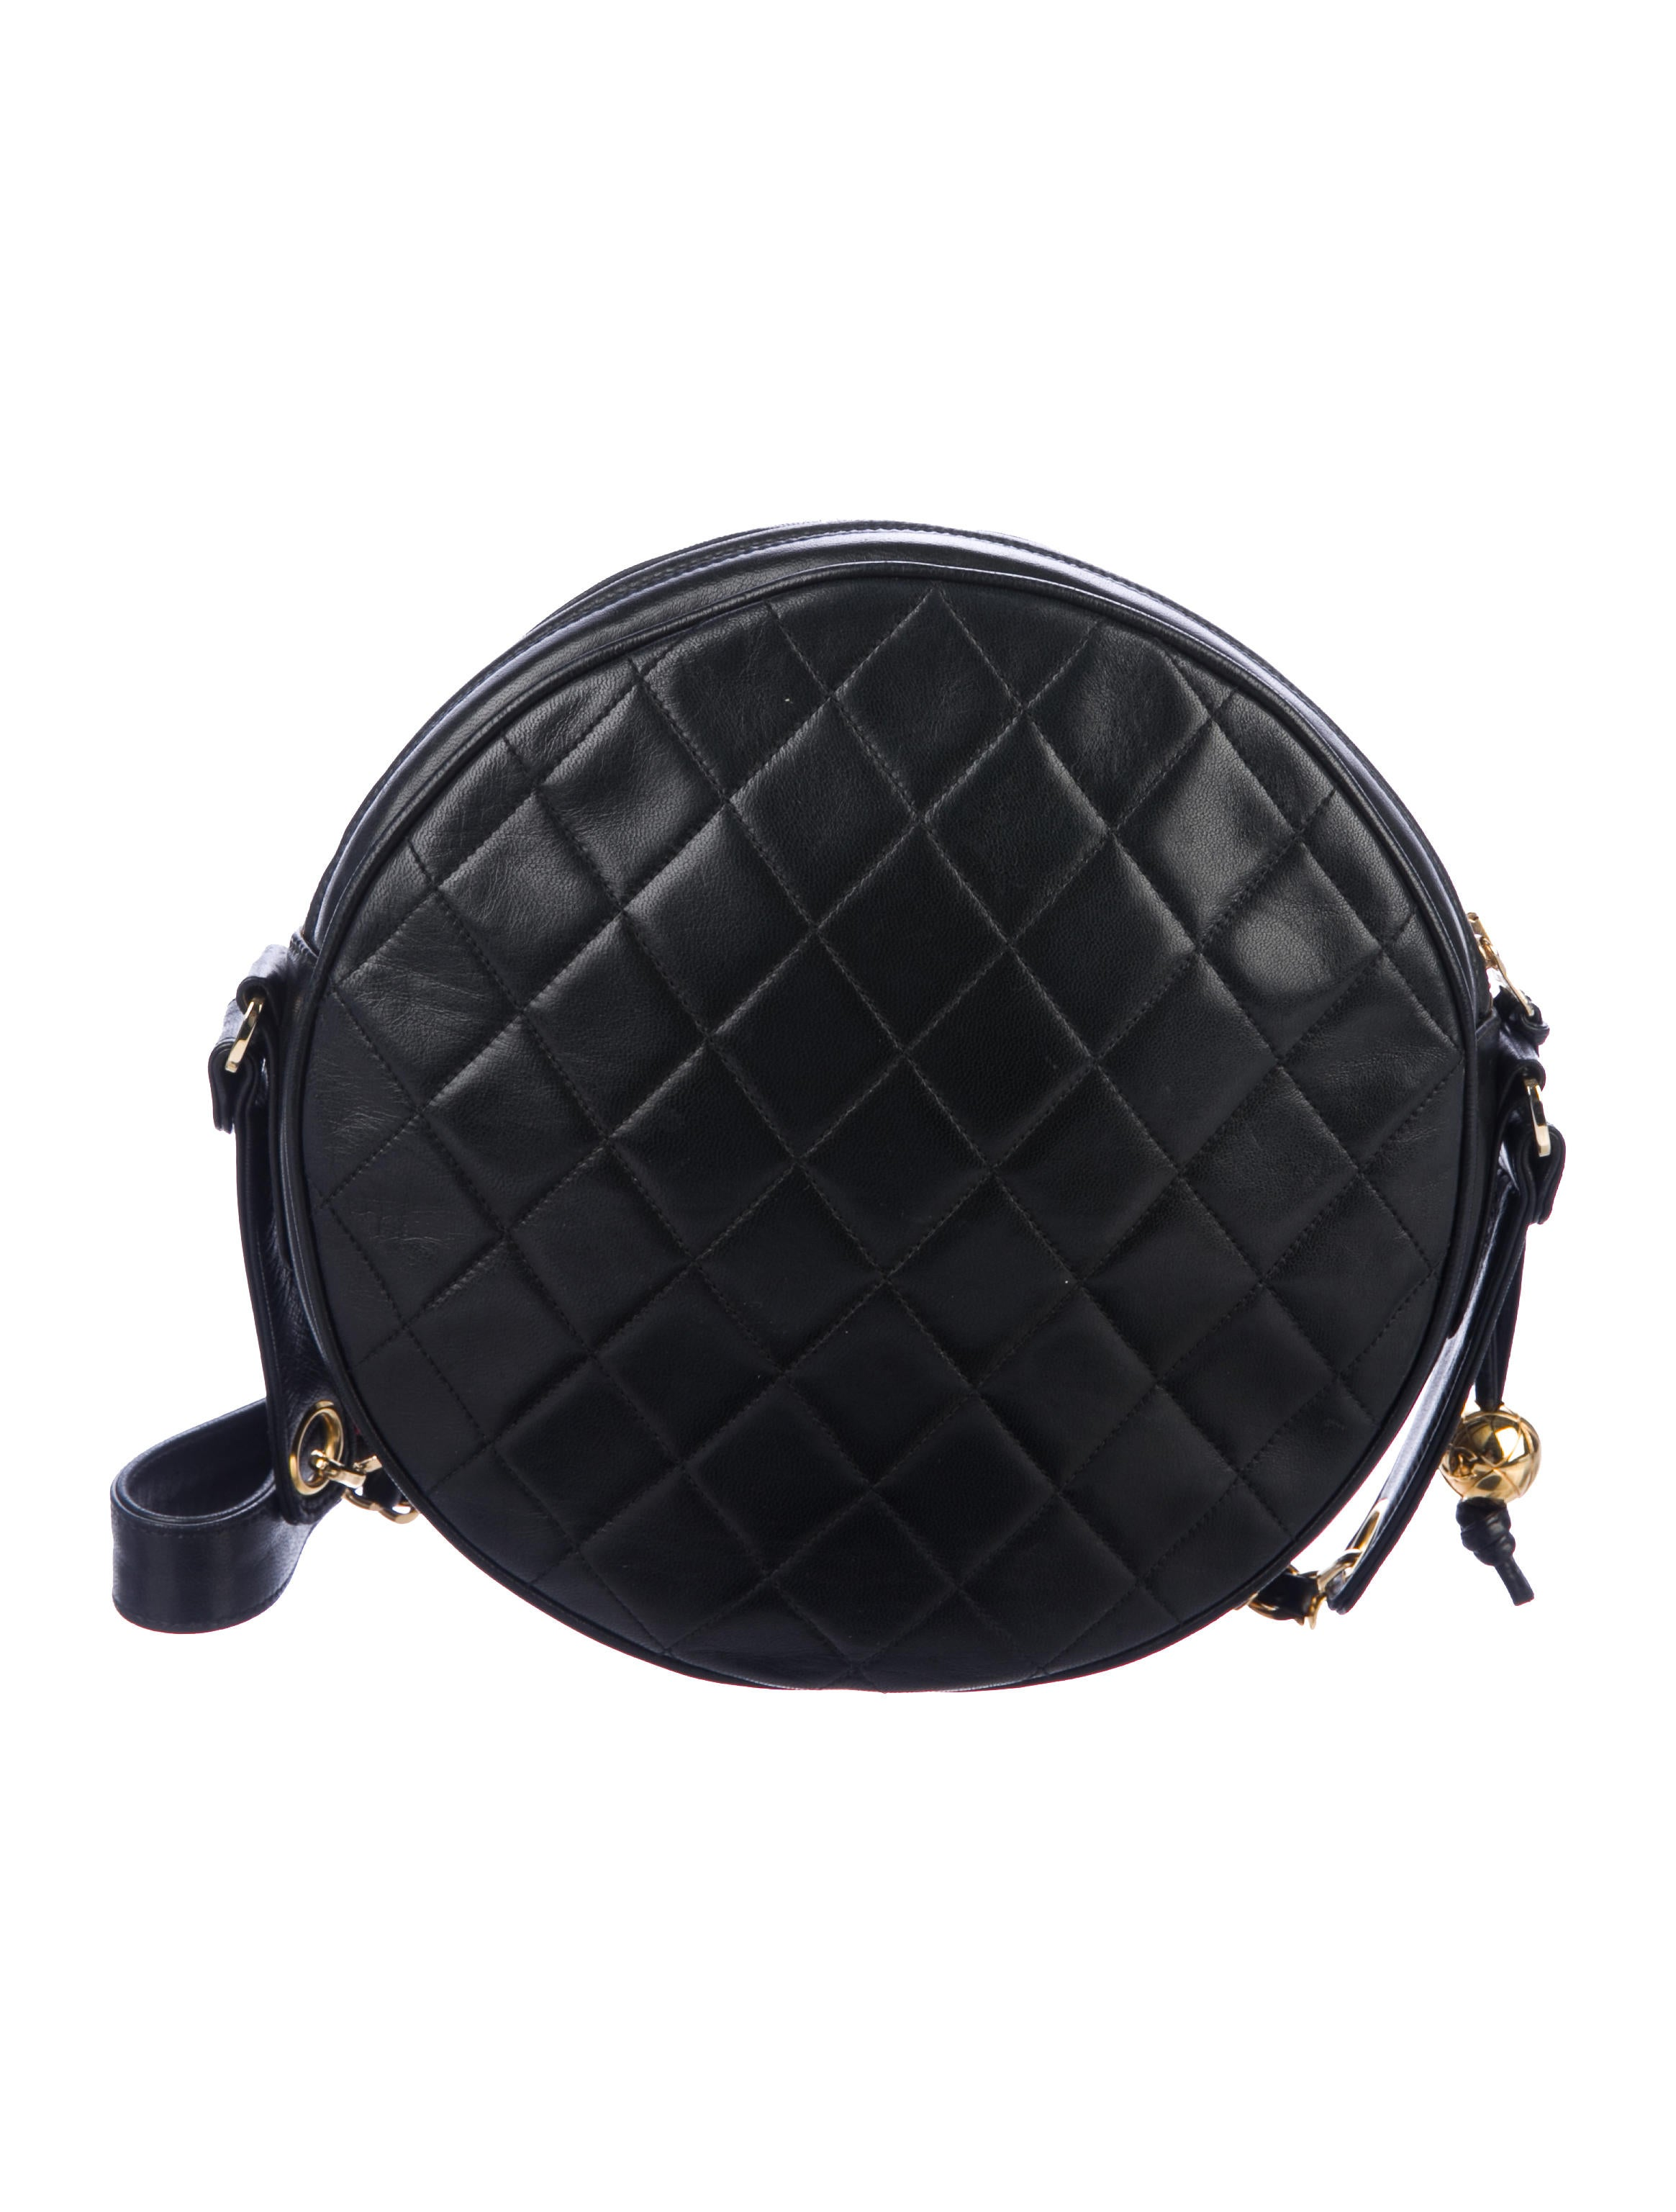 1af81764b37a Shoptagr | Vintage Quilted Circle Bag by Chanel